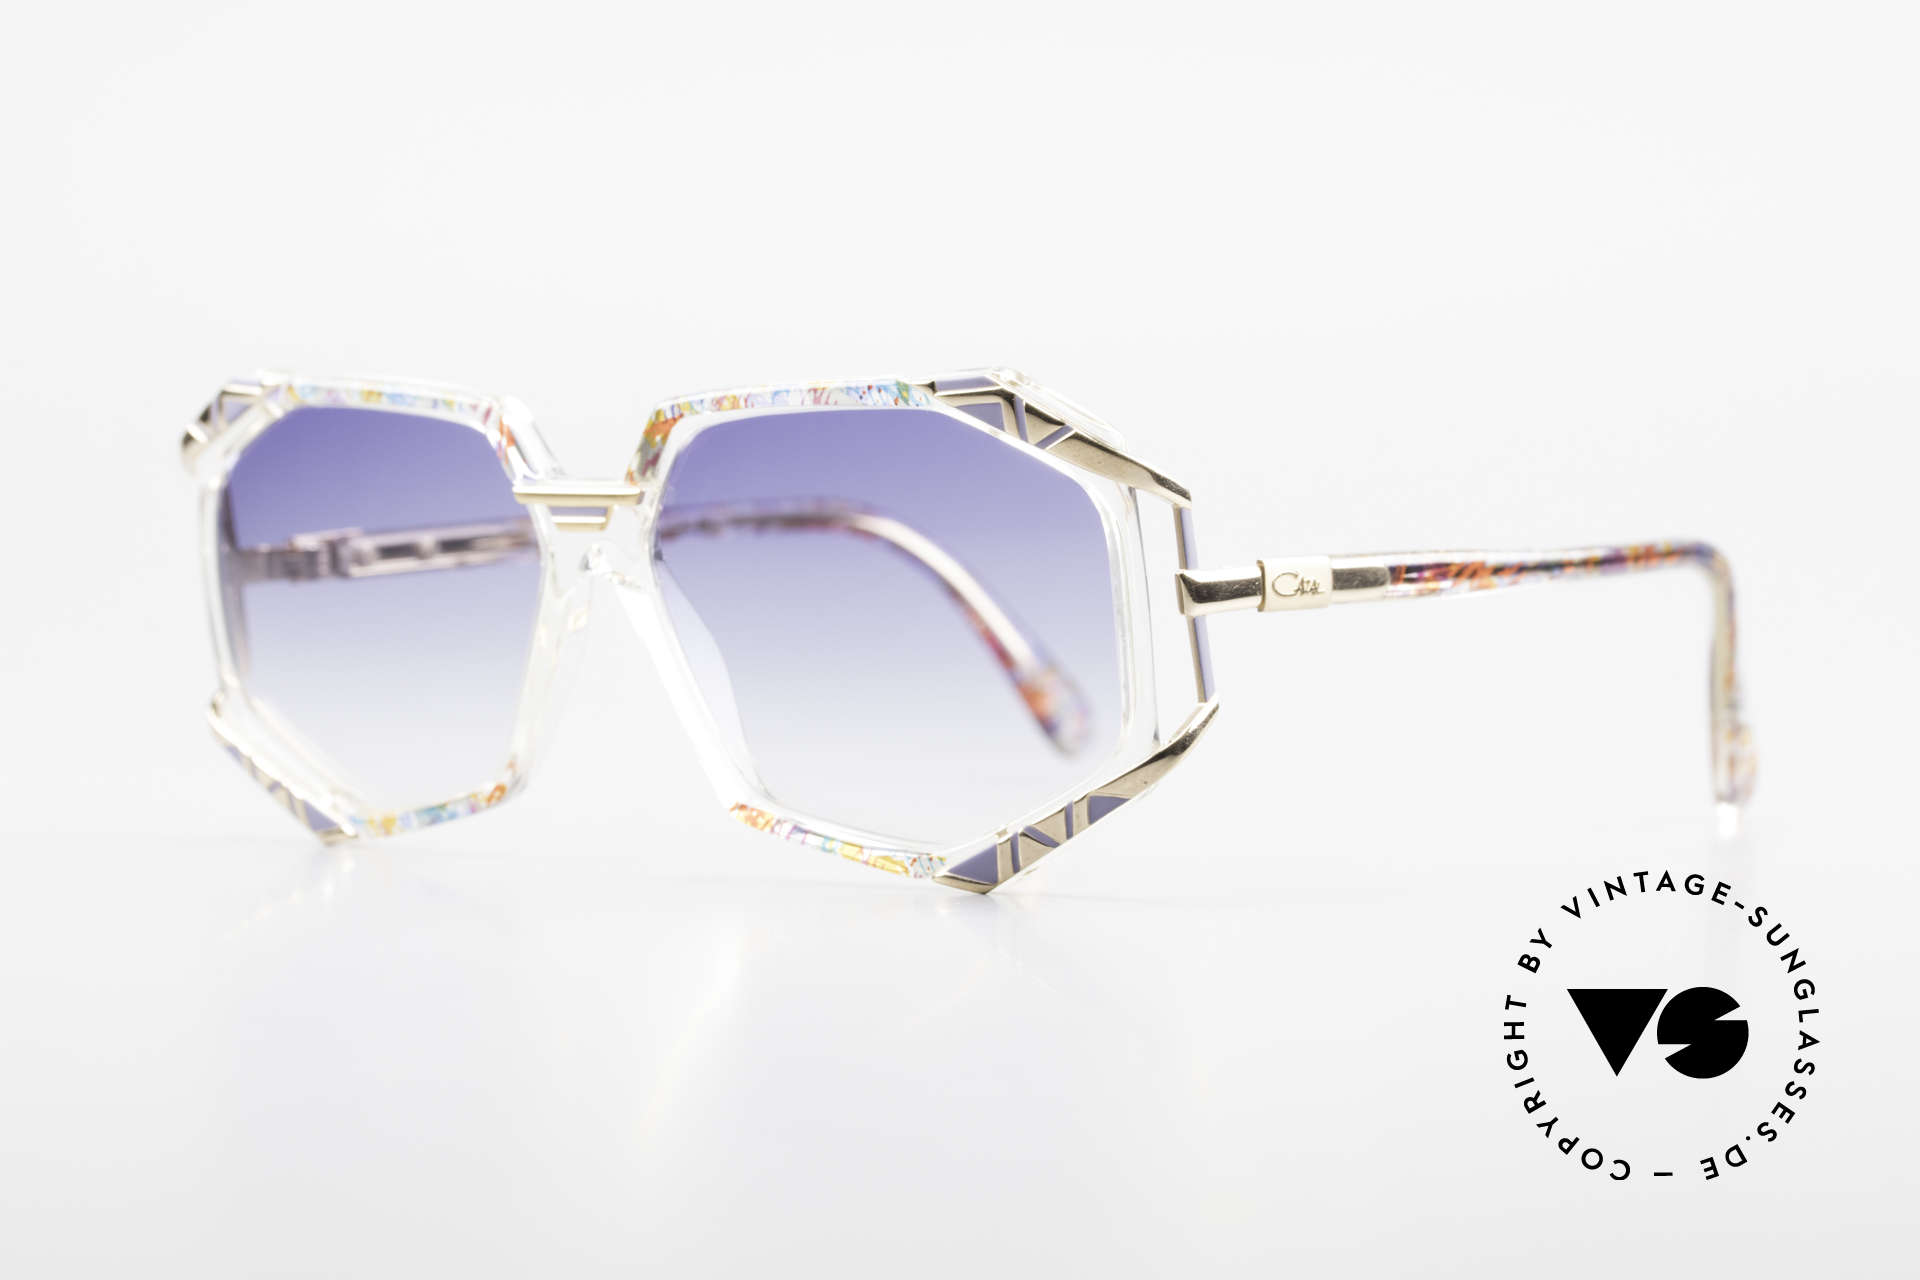 Cazal 355 Extraordinary Sunglasses 90's, terrific frame pattern by CAri ZALloni (check the pics!), Made for Women